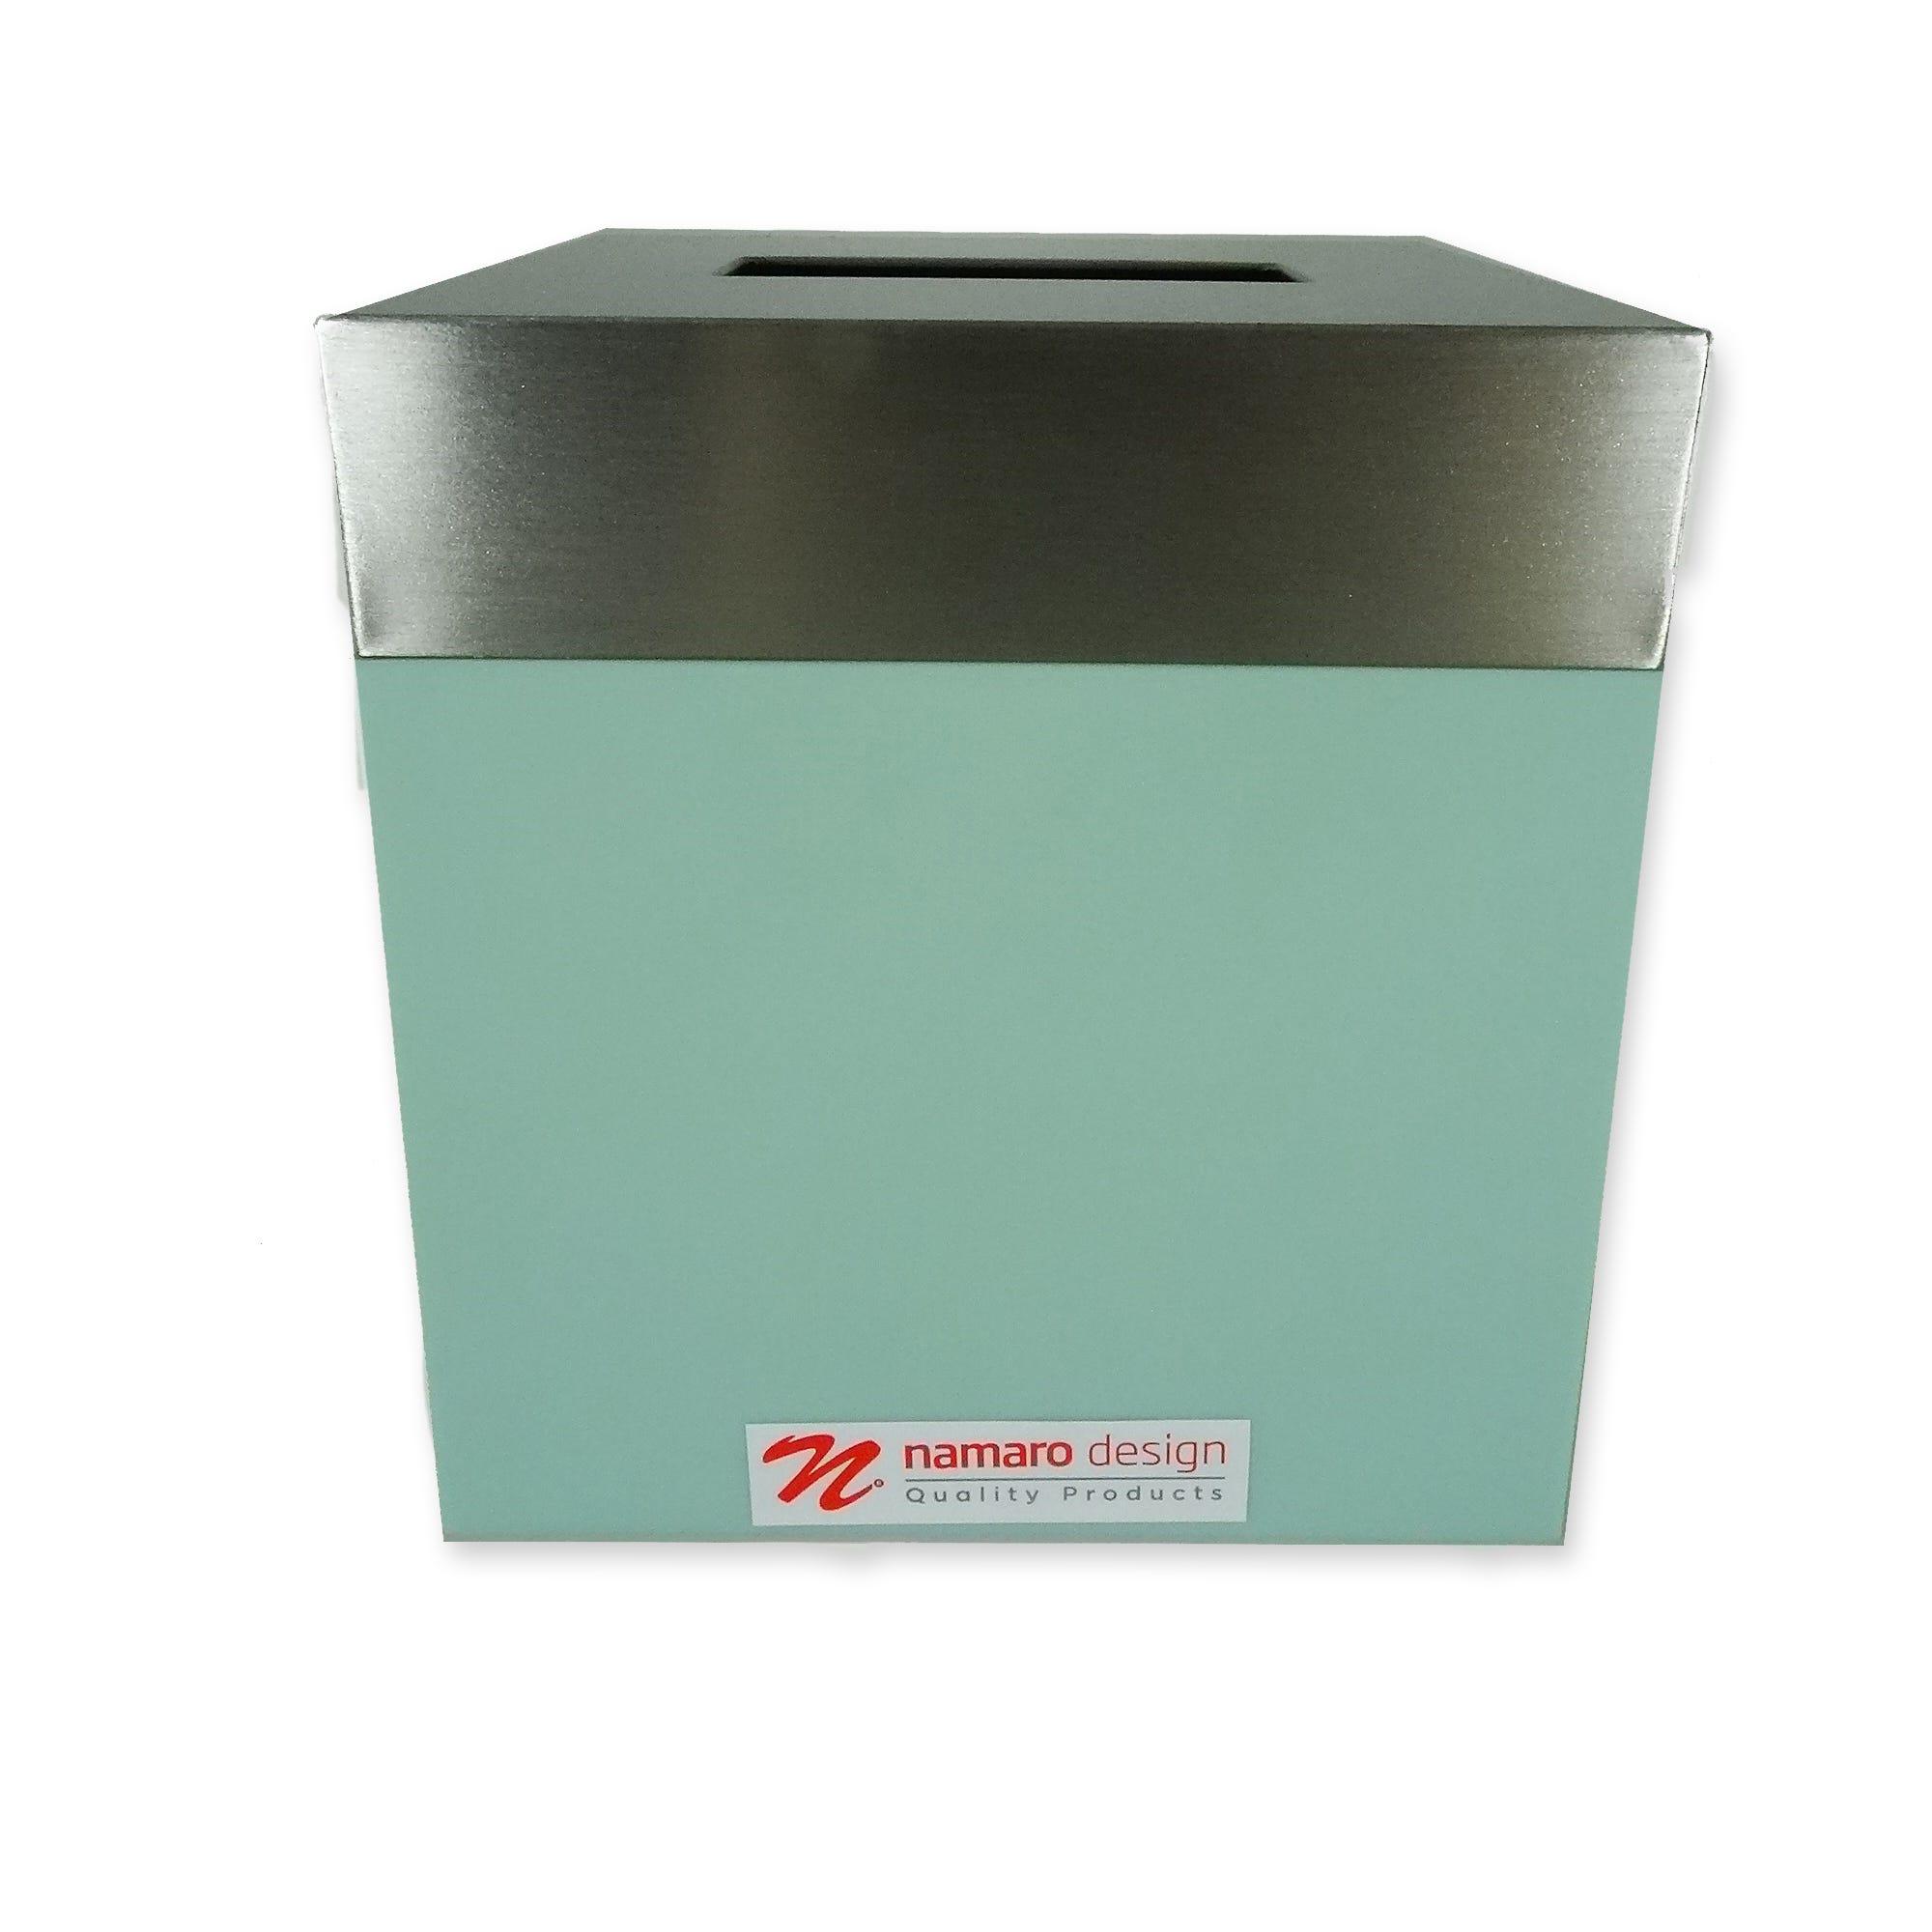 Namaro Design Dispensador de pañuelos desechables en verde menta